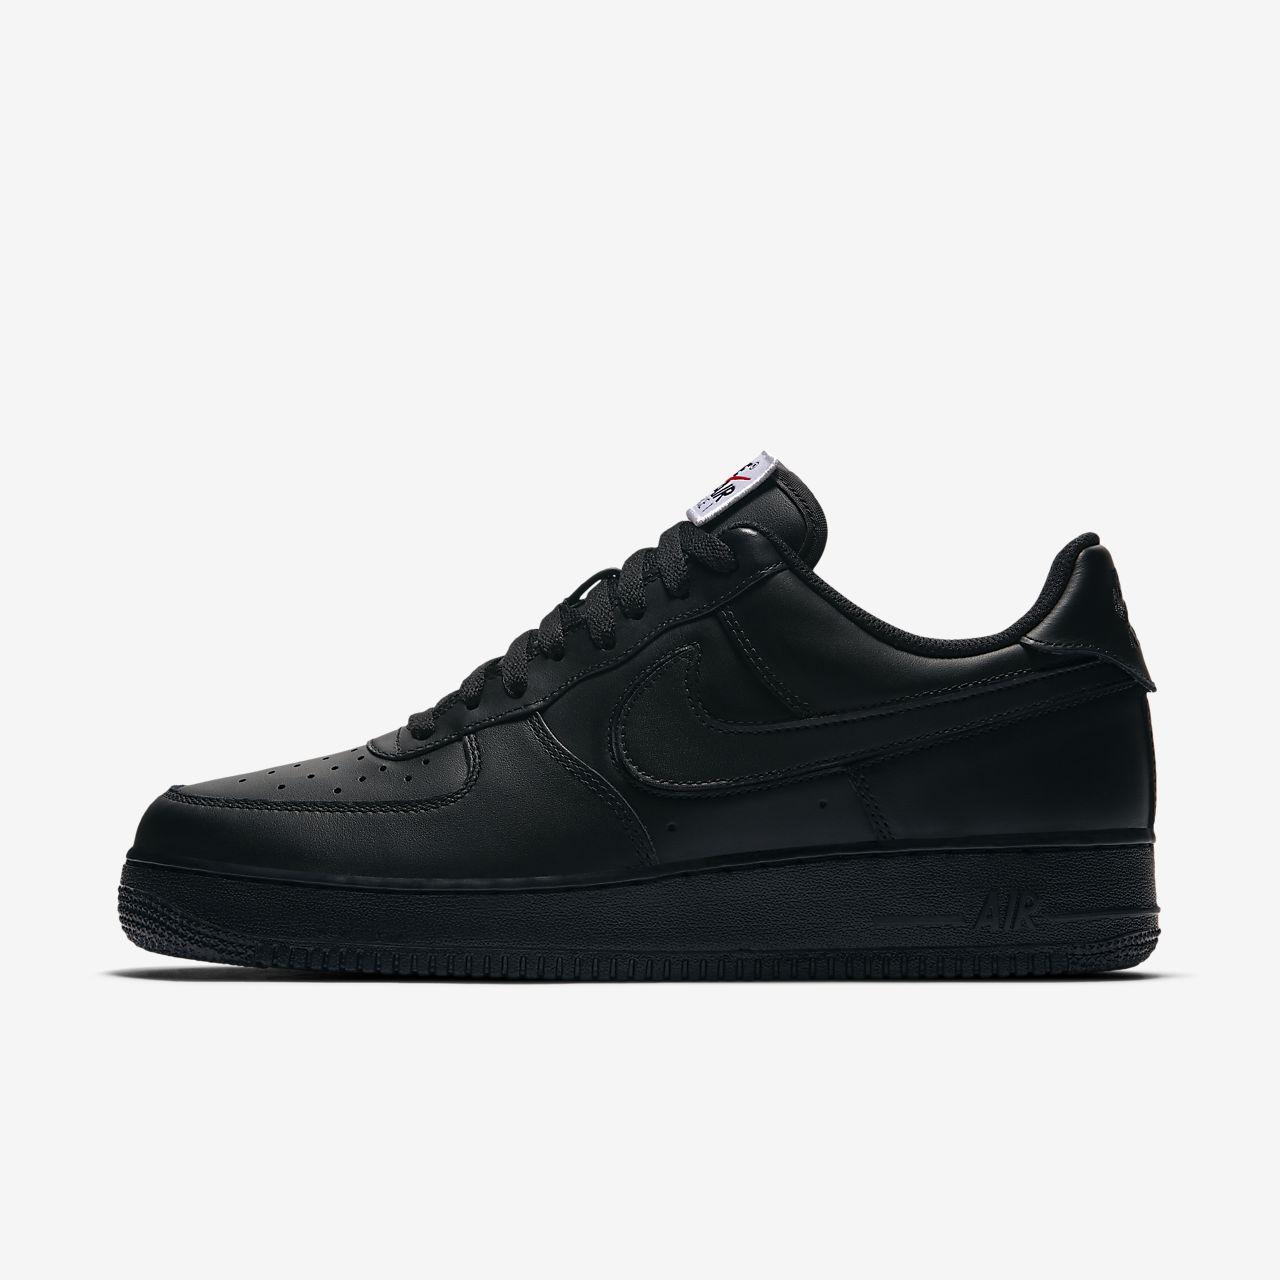 Nike Air Force 1 O7 Qs Pack Swoosh visite Z0YGG0elXc